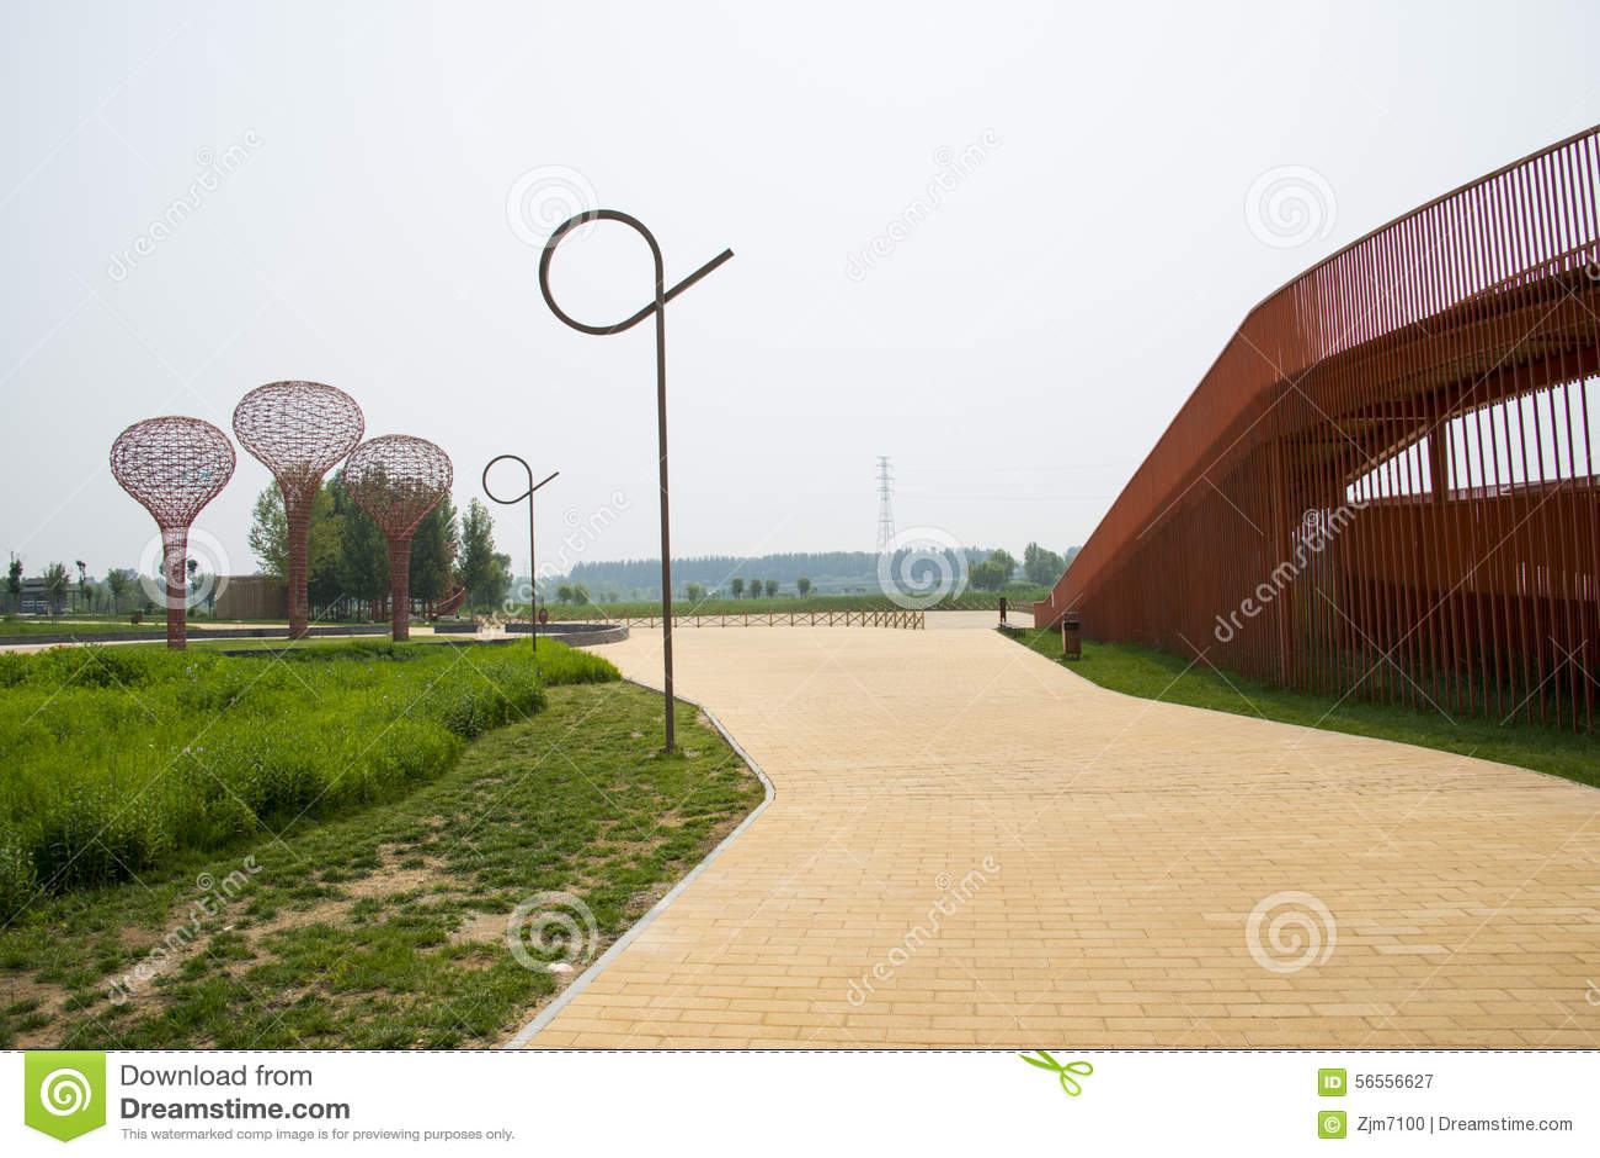 Download Ασία Κίνα, Πεκίνο, Yanqing, παγκόσμιο κρασί EXPO, σύγχρονο γλυπτό ŒLandscape Architectureï ¼, Εκδοτική Φωτογραφία - εικόνα από υπαίθριος, κόσμος: 56556627